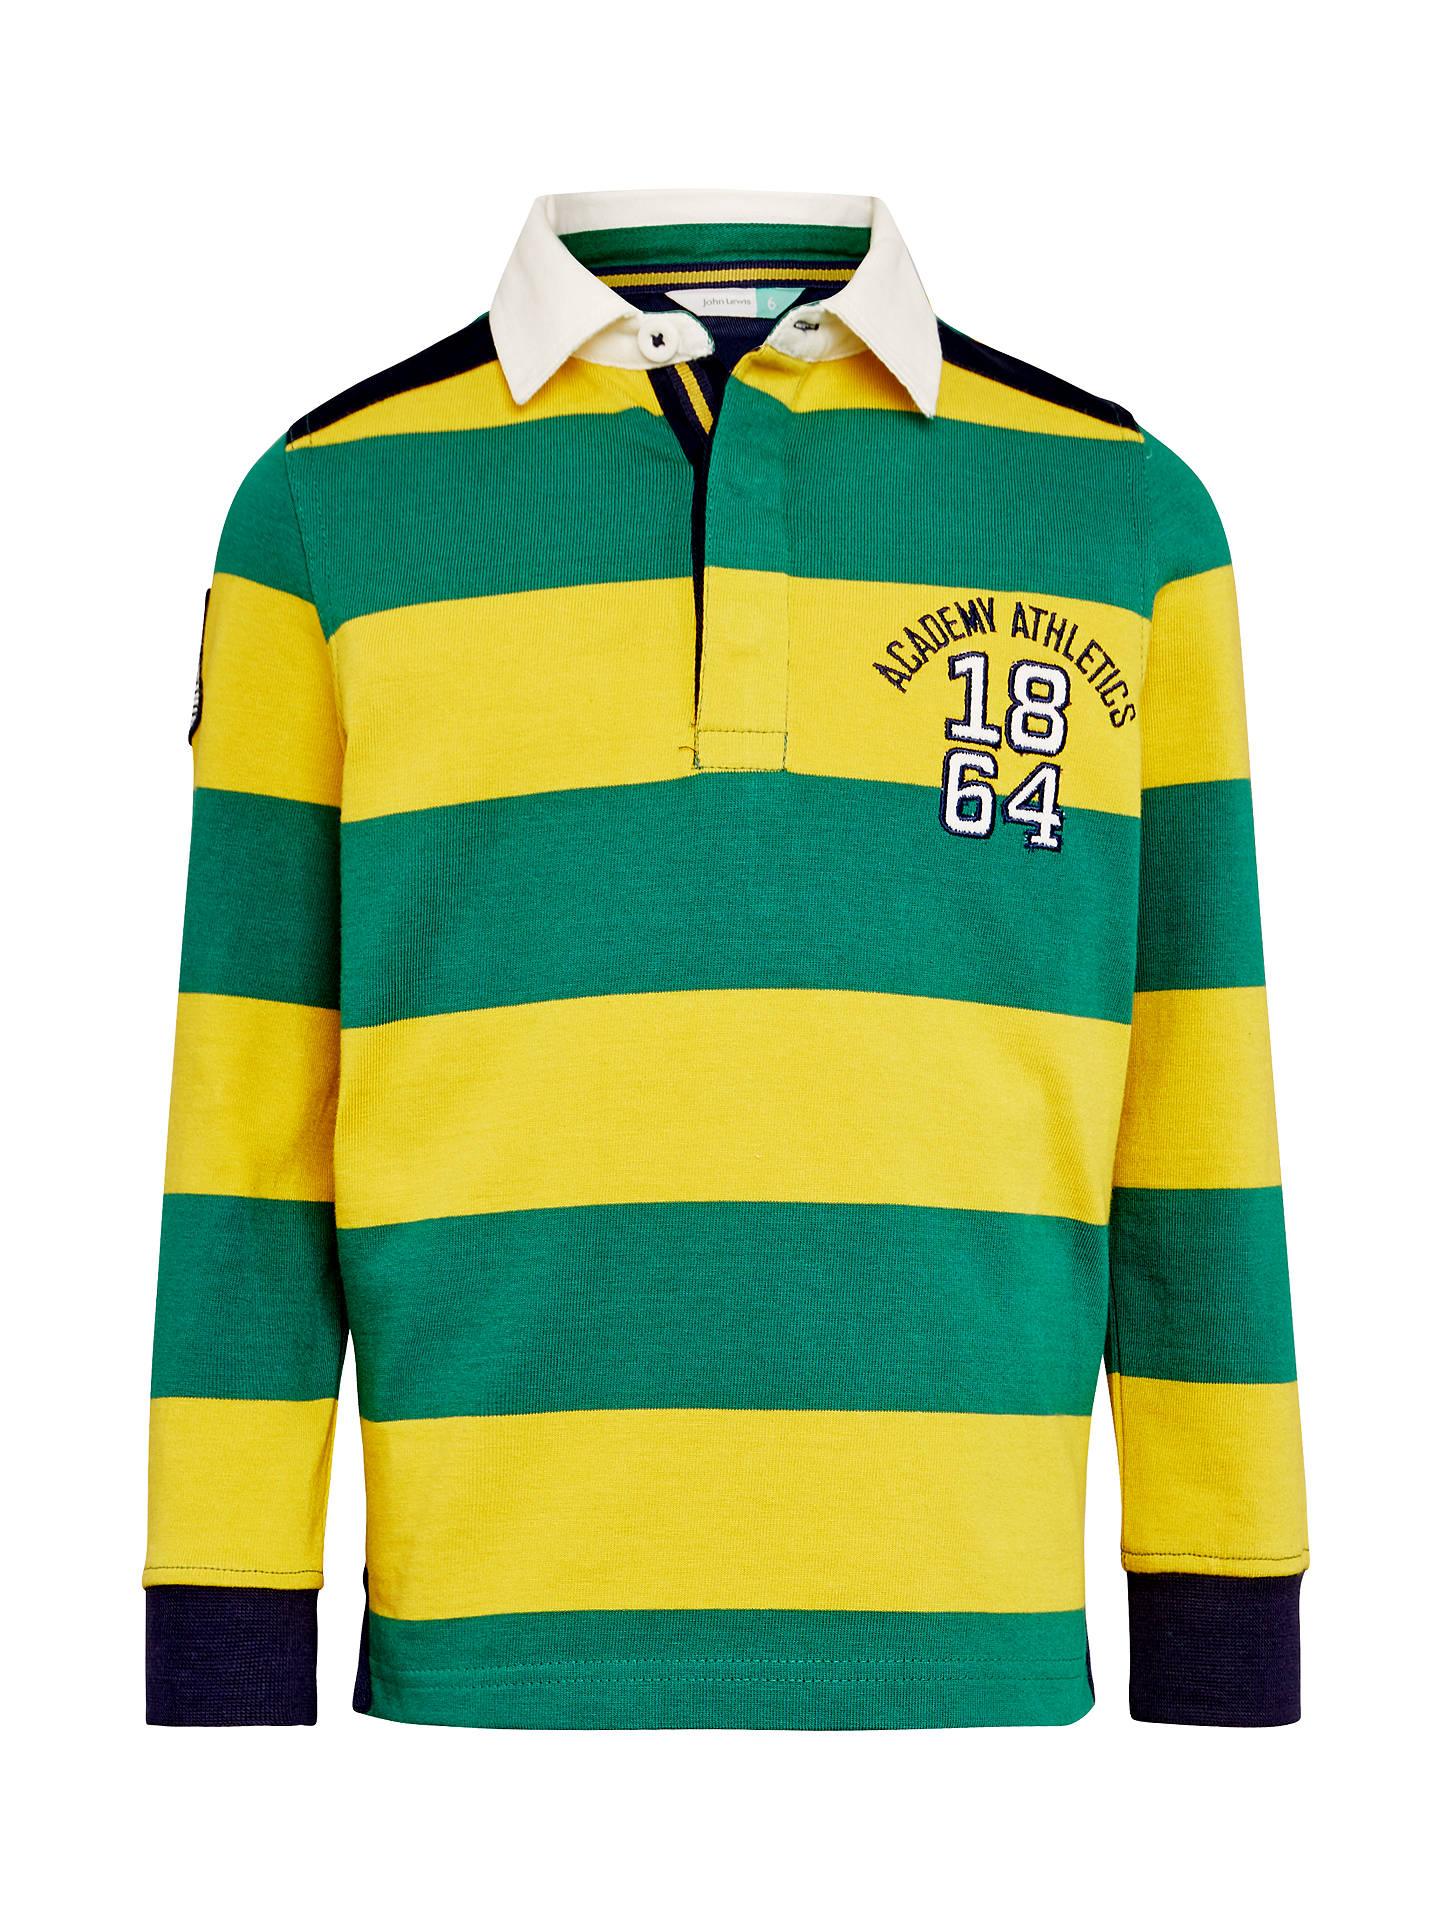 e043906222a John Lewis Boys' Bar Stripe Rugby Top, Green/Yellow at John Lewis ...